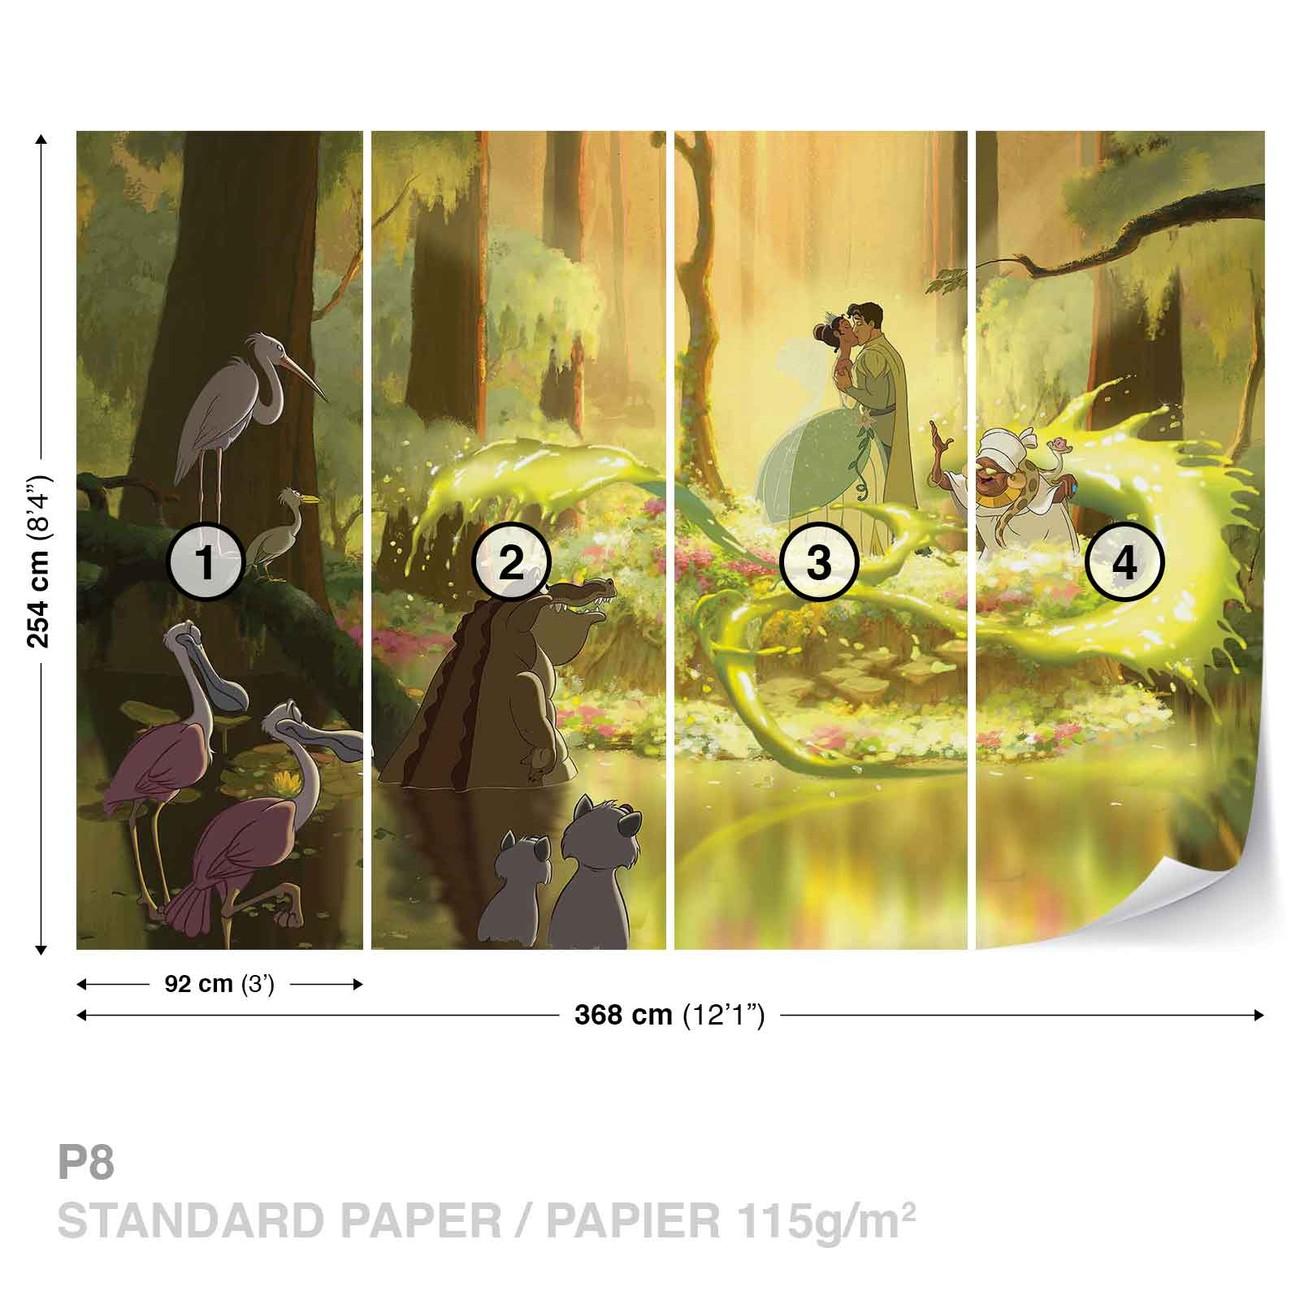 Disney Princesses Tiana Frog Kiss Wall Paper Mural | Buy at ...